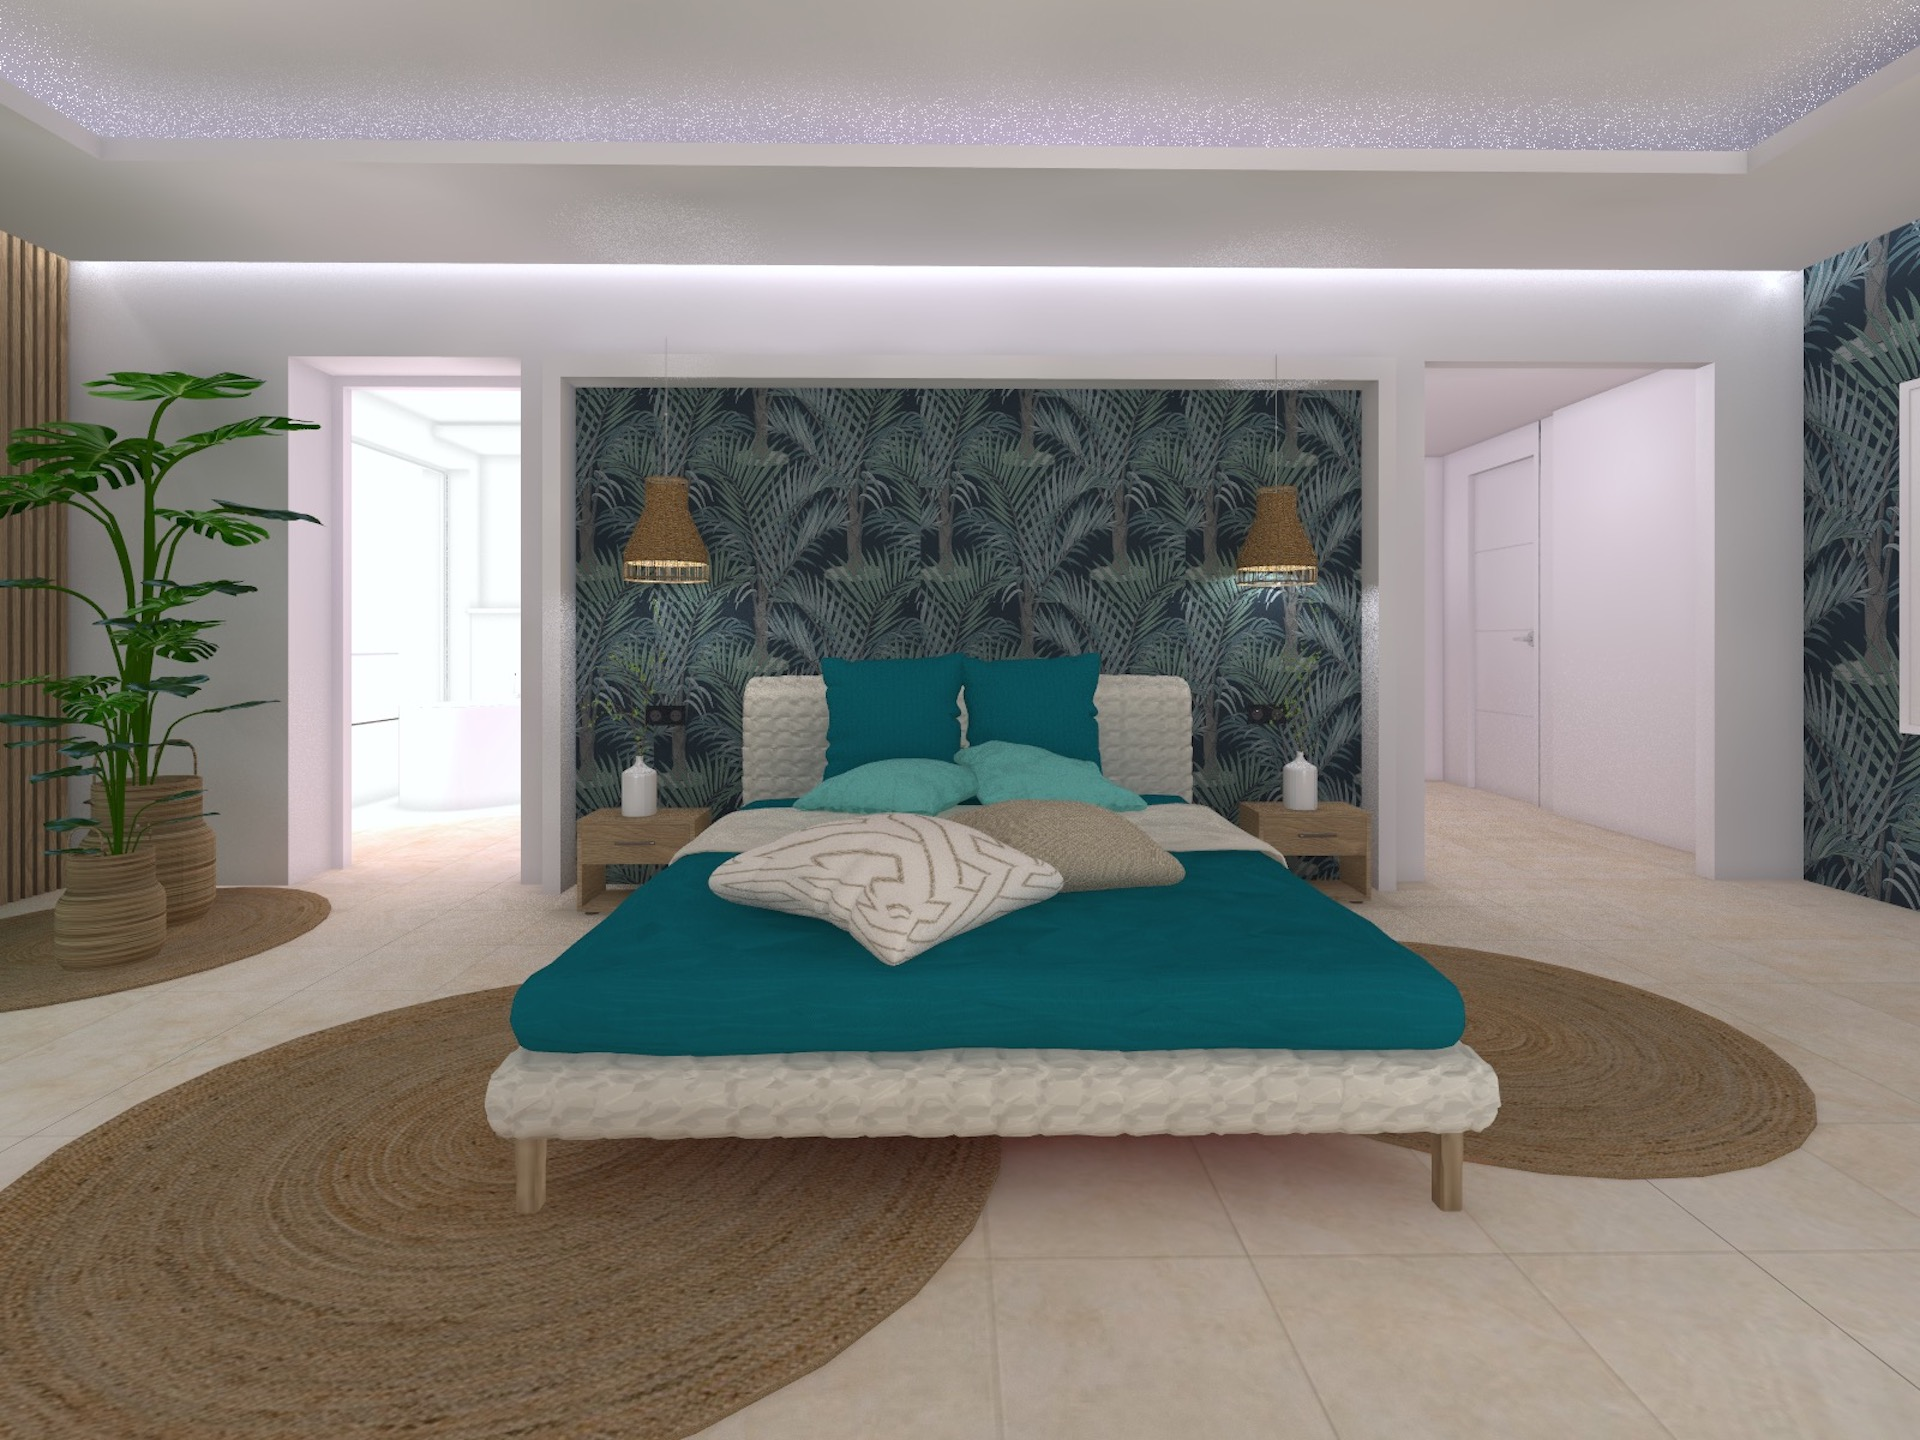 renovation villa luxe semaphore sainte-maxime var architecture interieure23